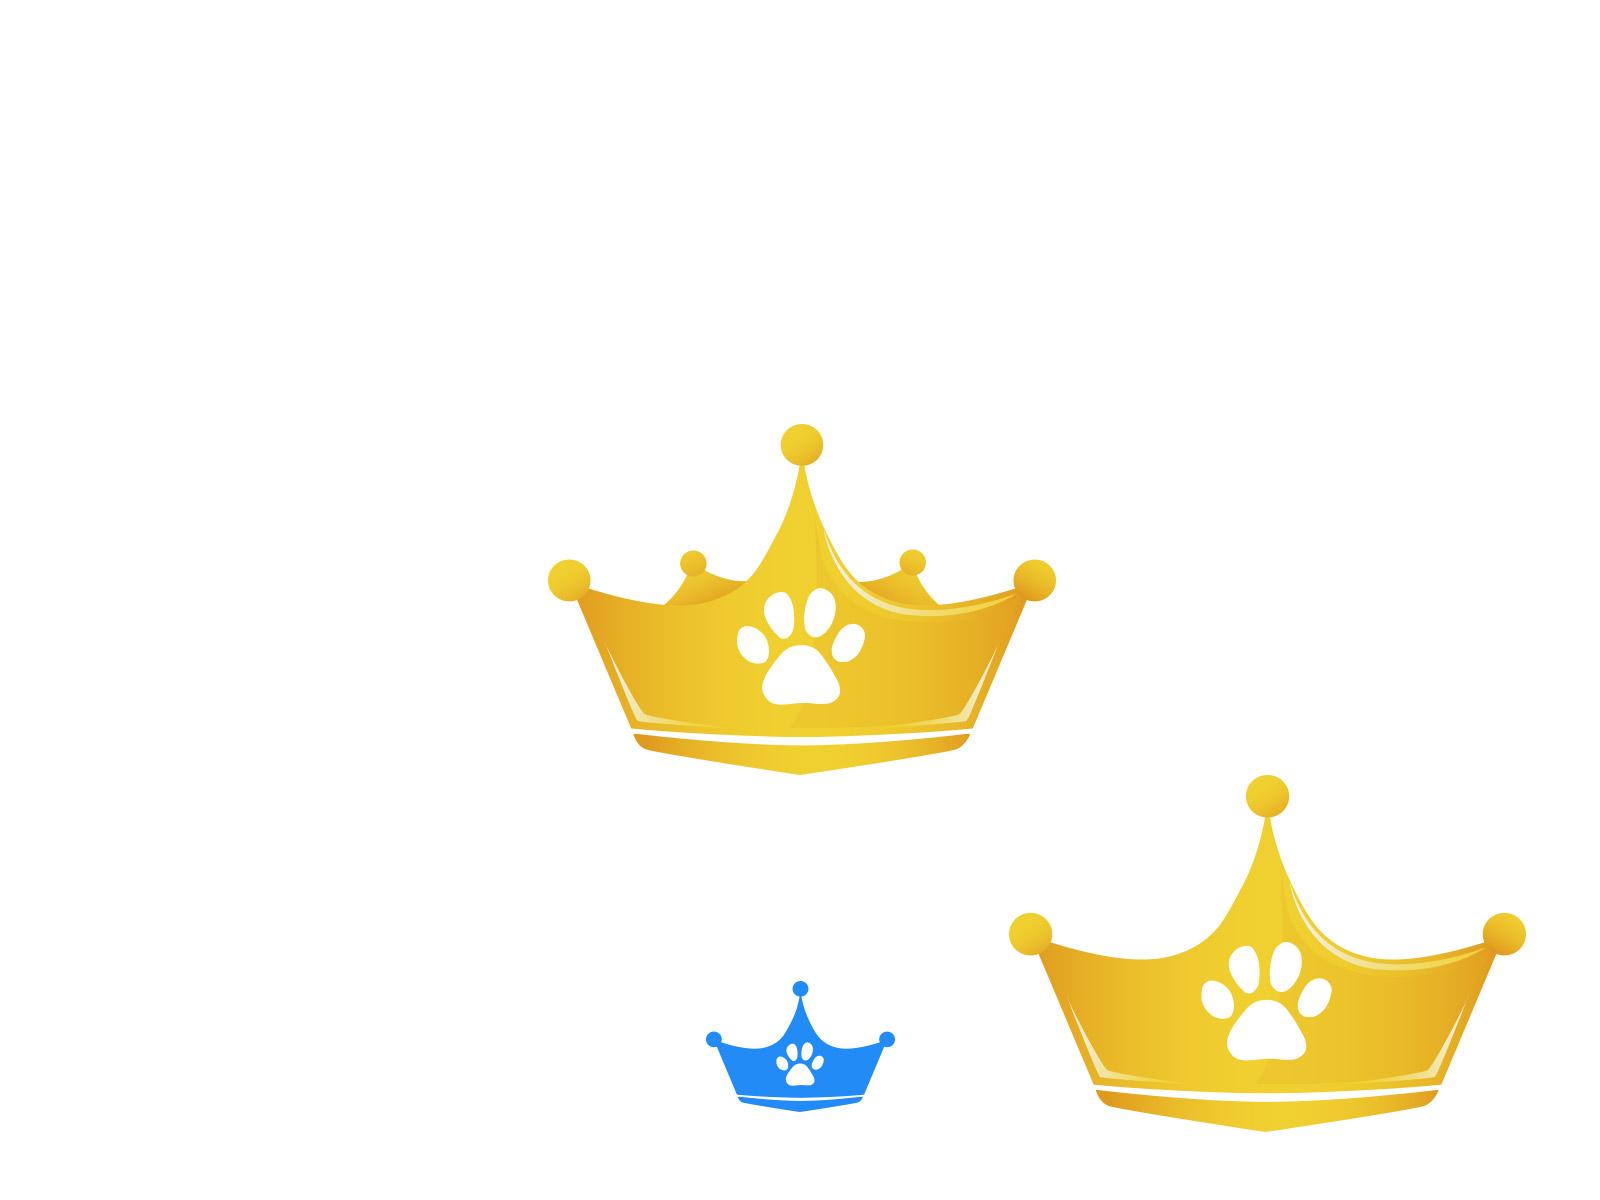 Logo Design by olii - Entry No. 133 in the Logo Design Contest Fun Logo Design for MarQueen Animal Clinic.